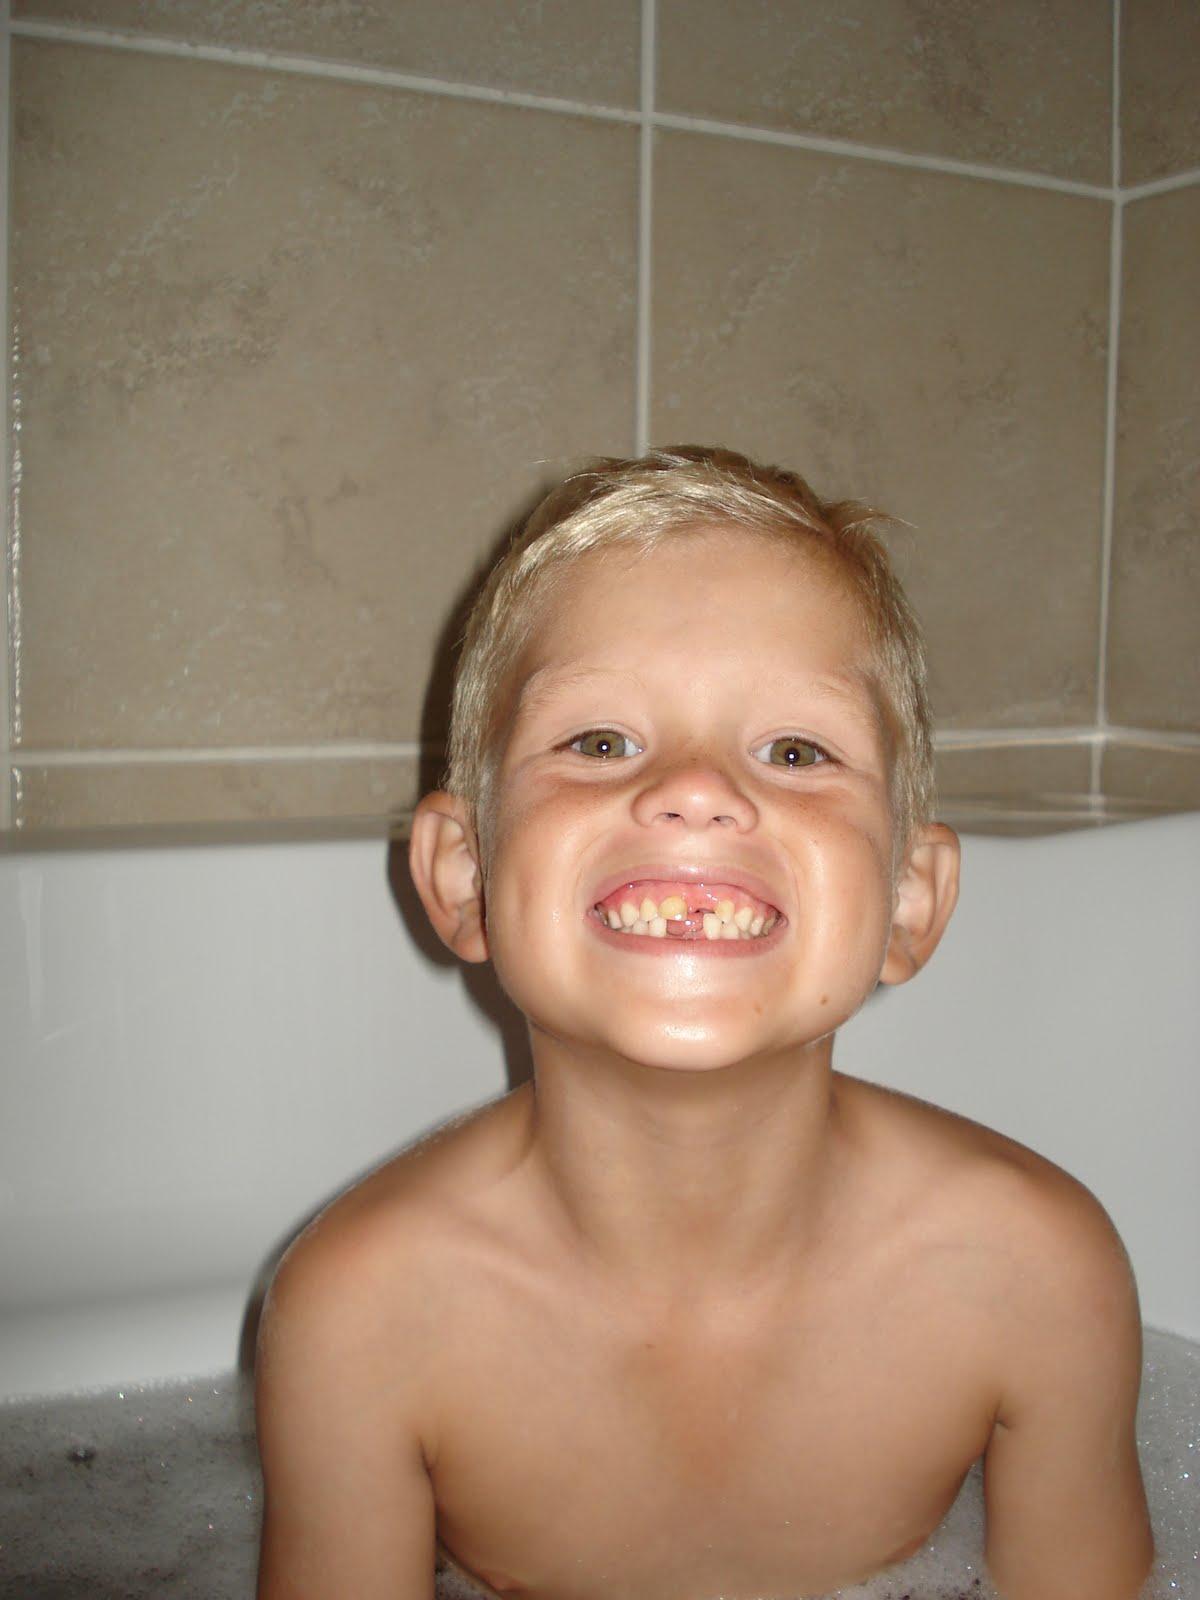 Ralphs Ruckus: Rub-A-Dub-Dub Three Kids in A Tub